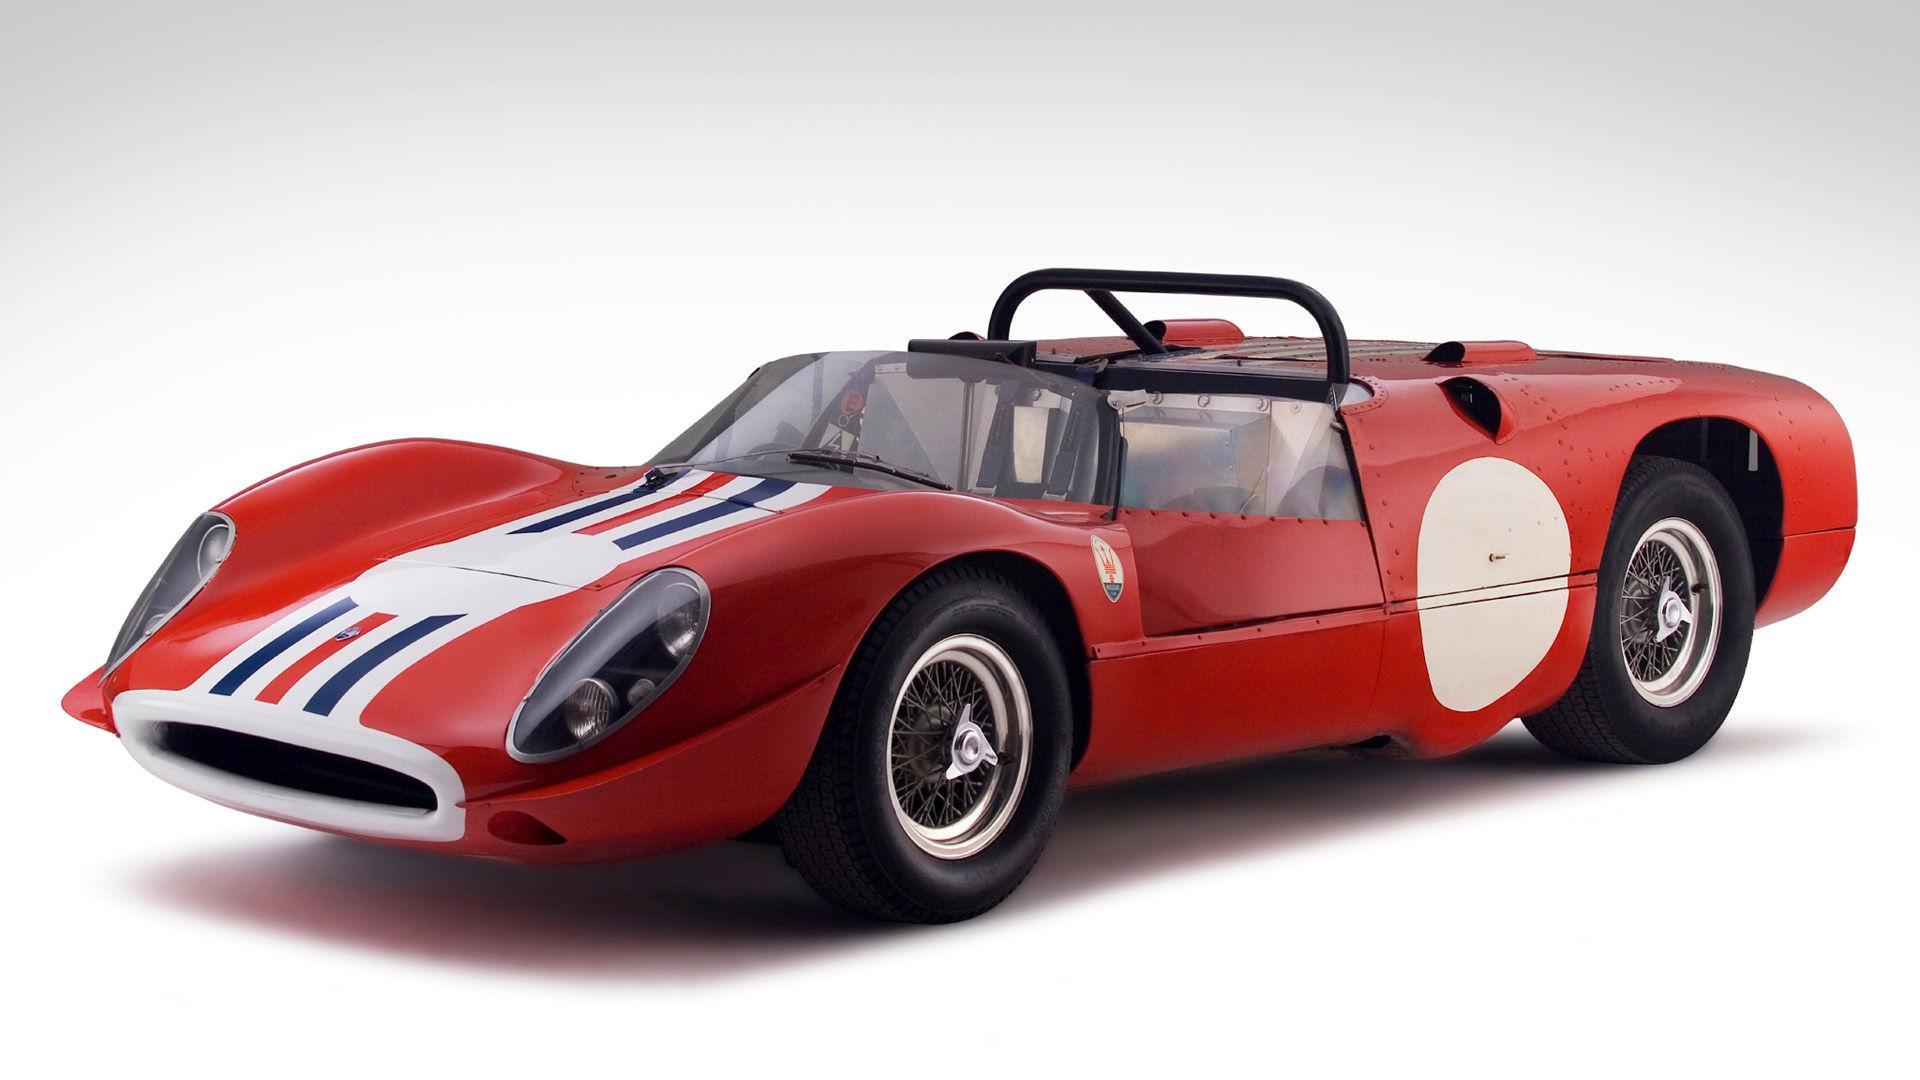 1965 Maserati Tipo 65 Birdcage